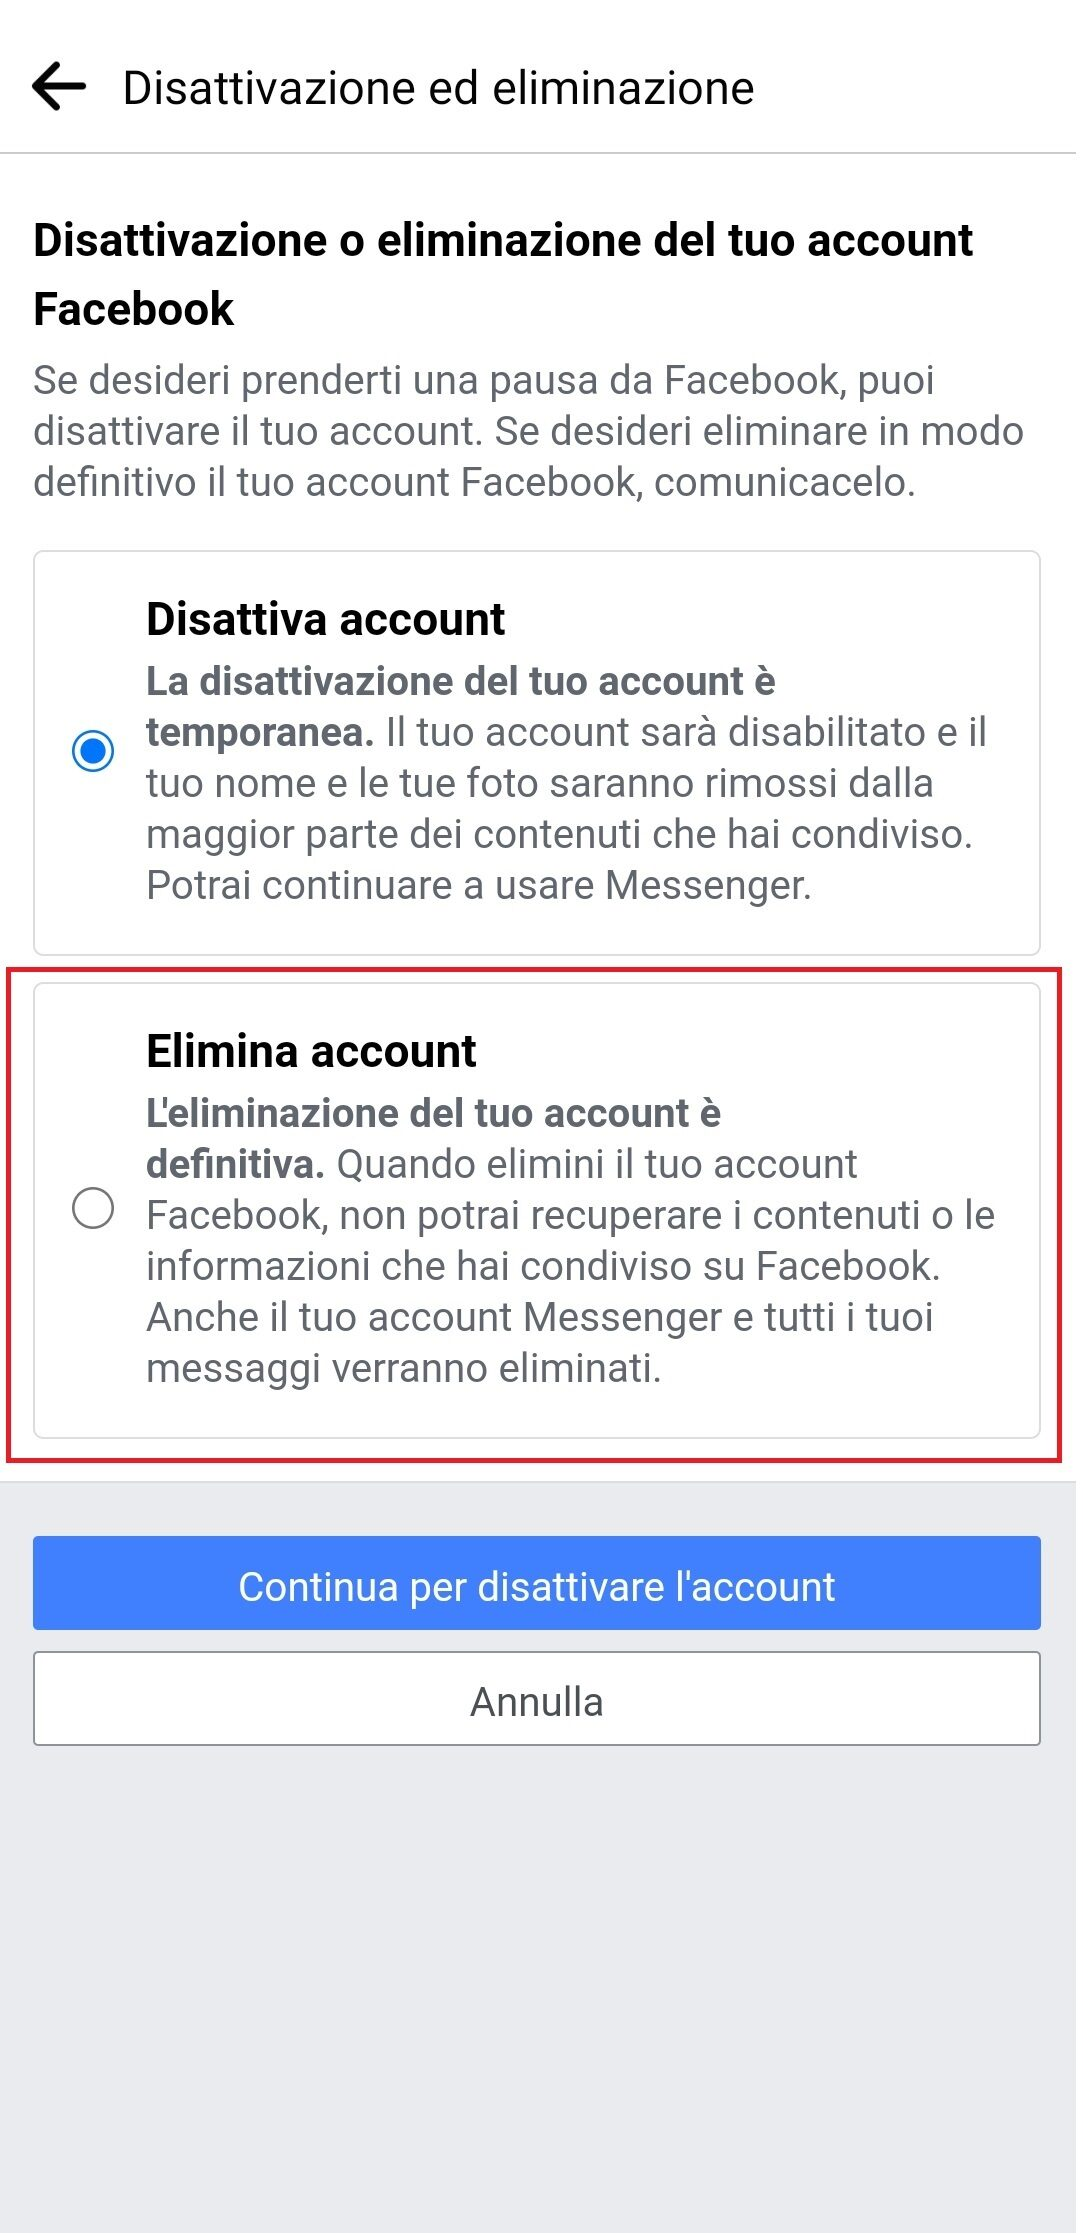 disattivazione o eliminazione account Facebook